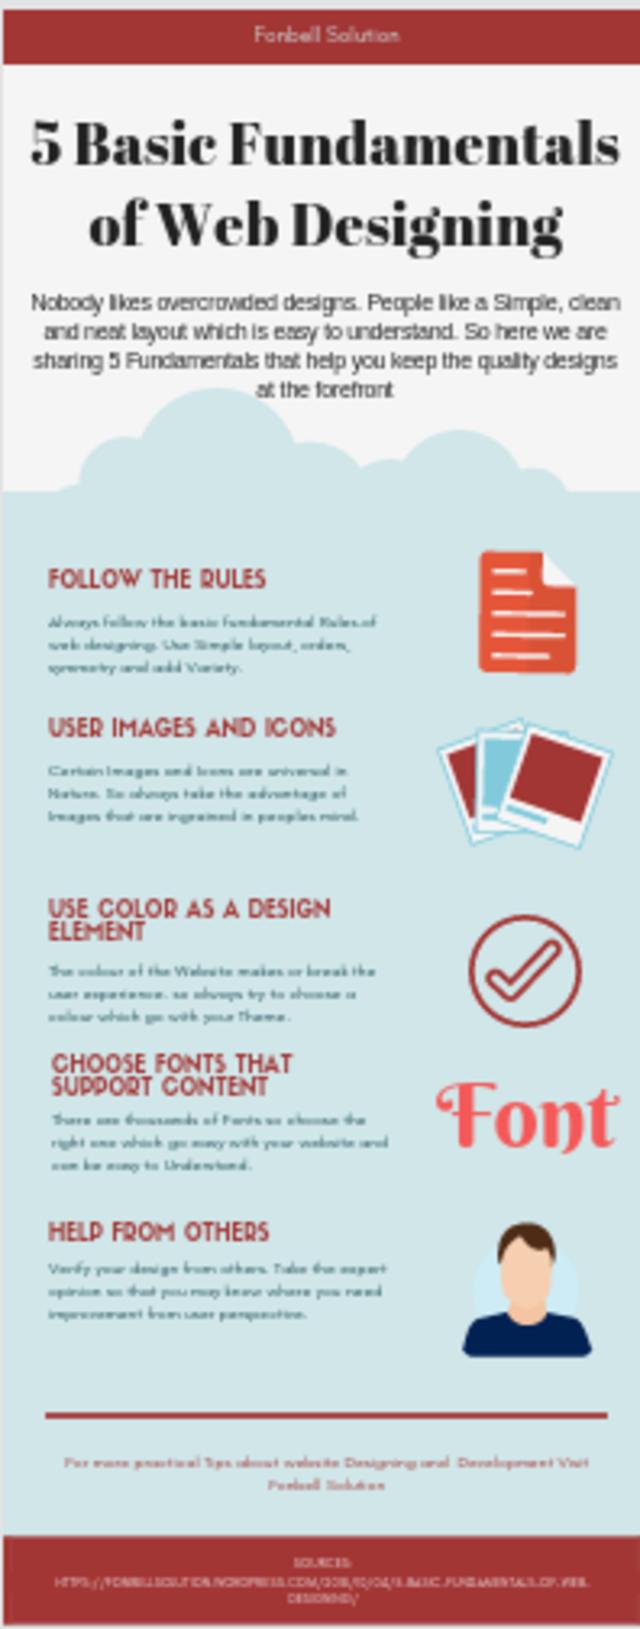 Fundamantals of web designing